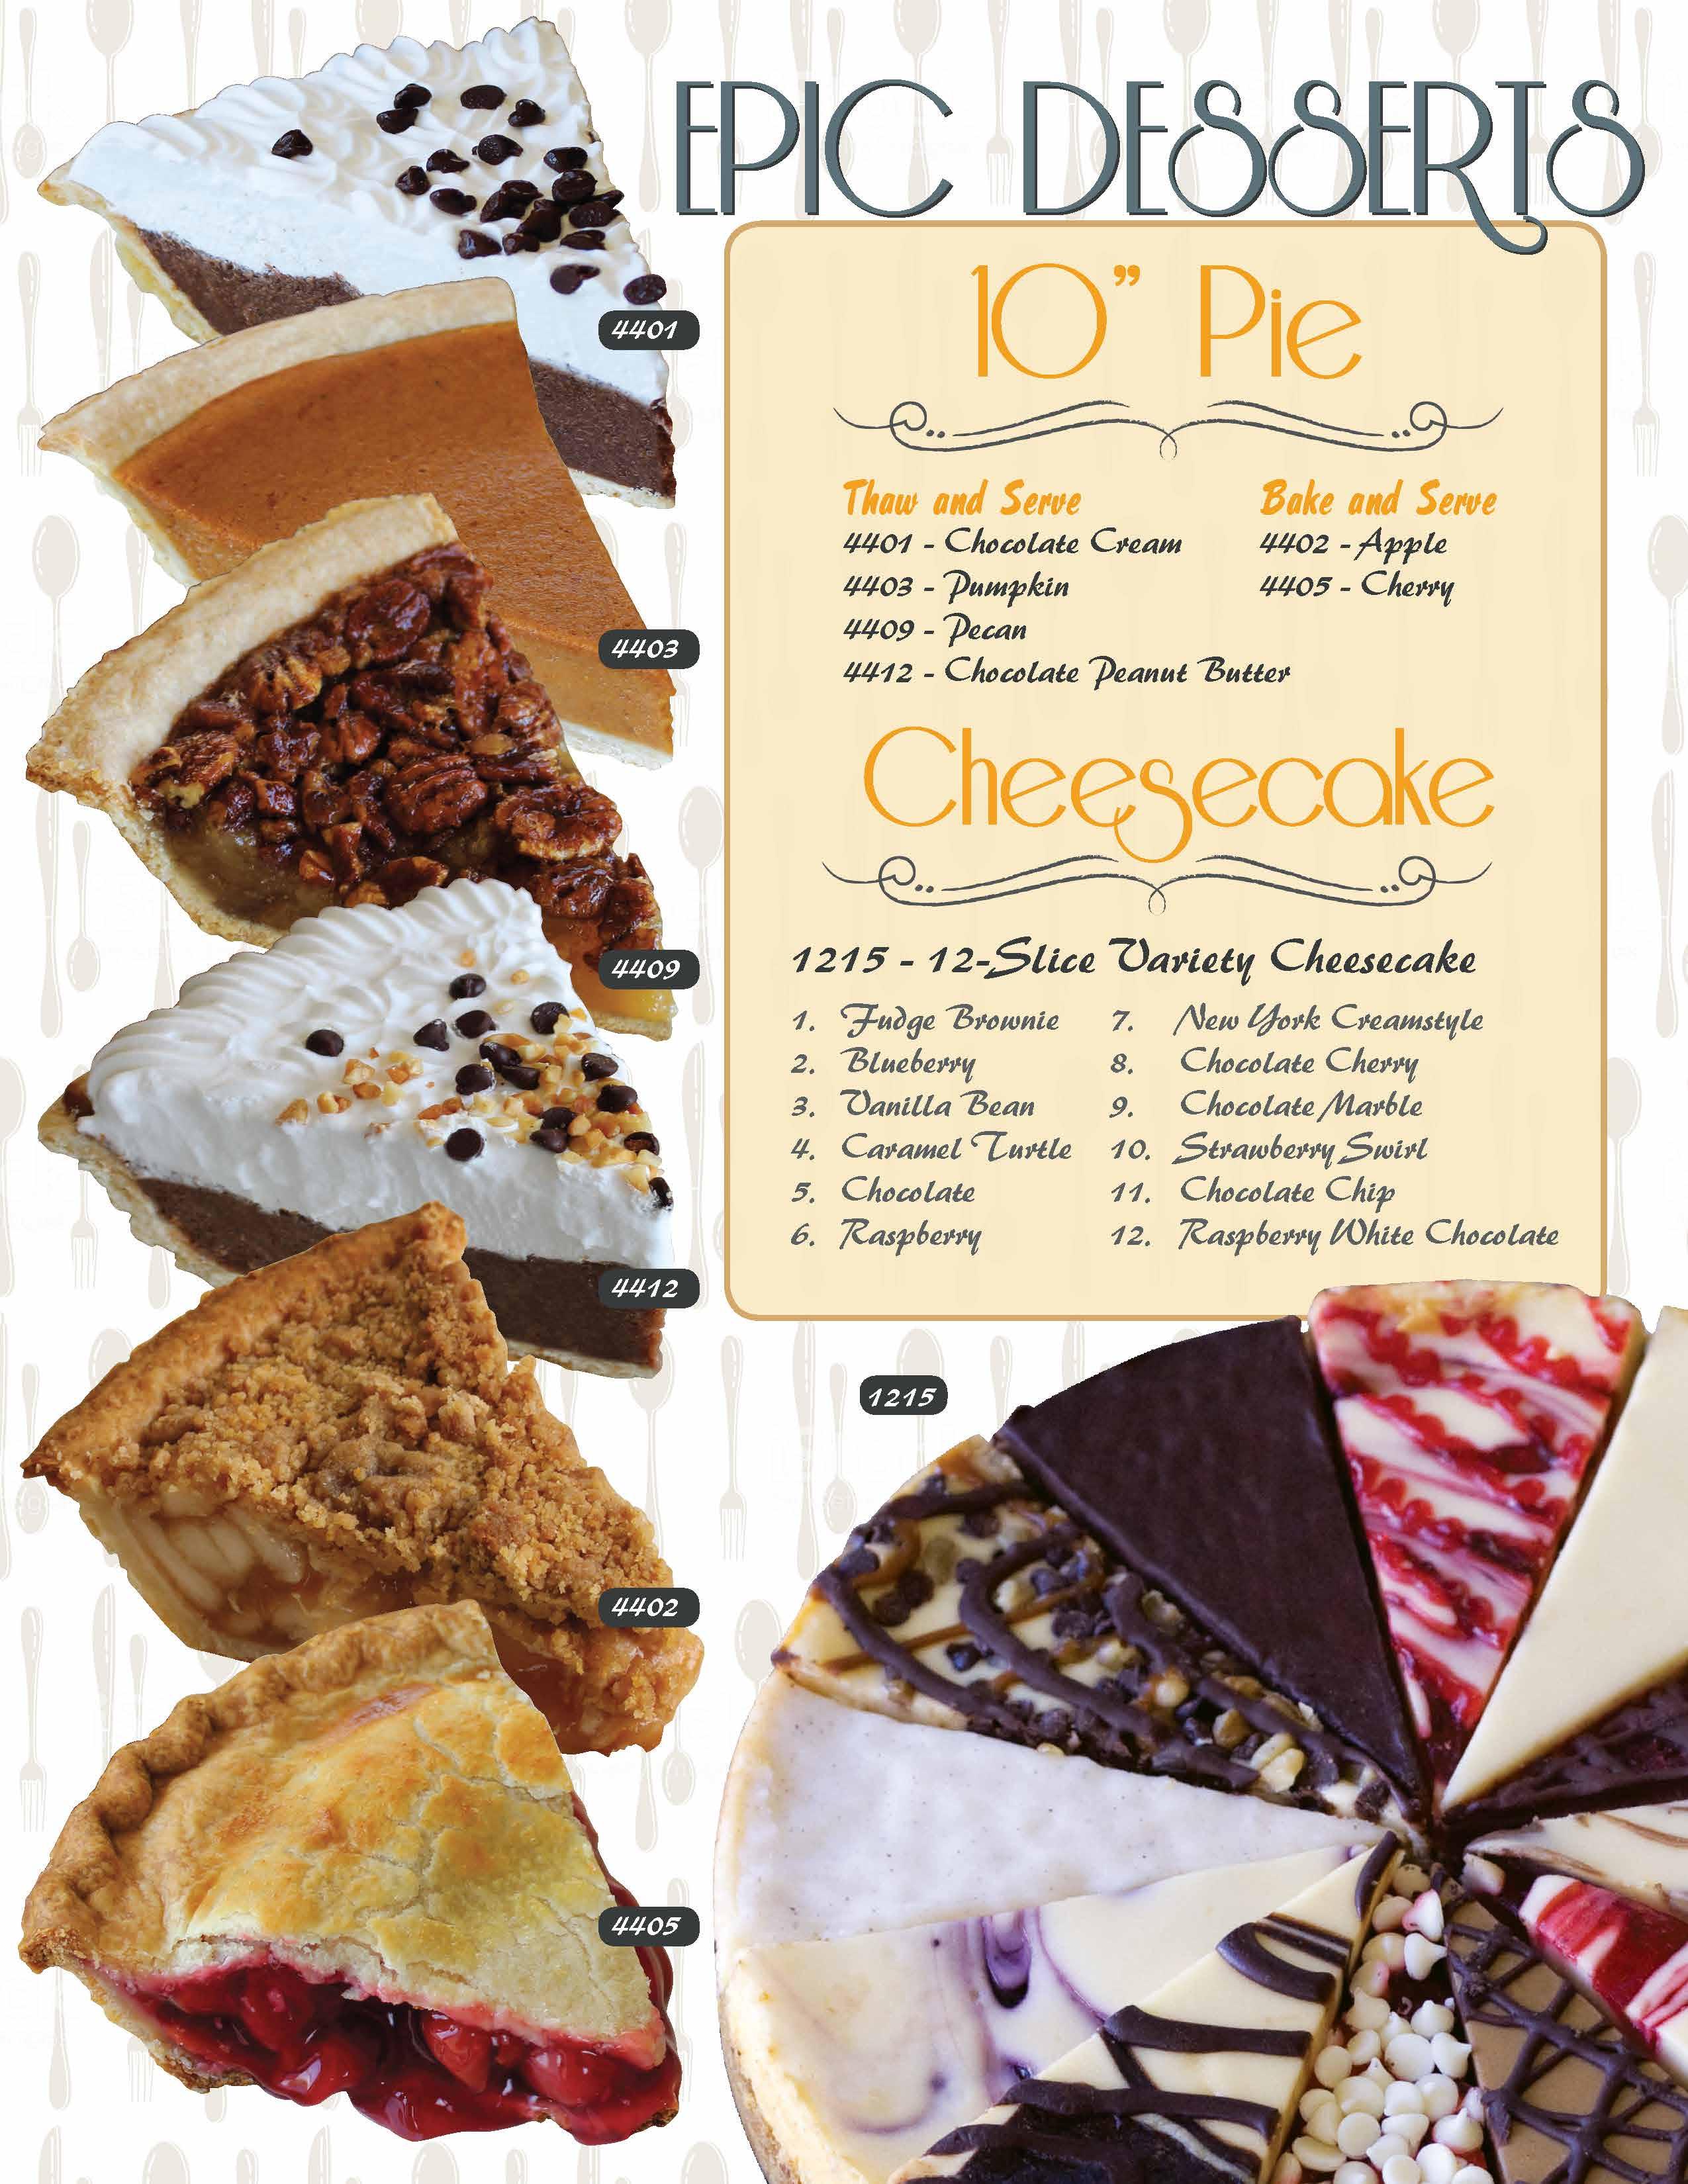 Epic Desserts Brochure